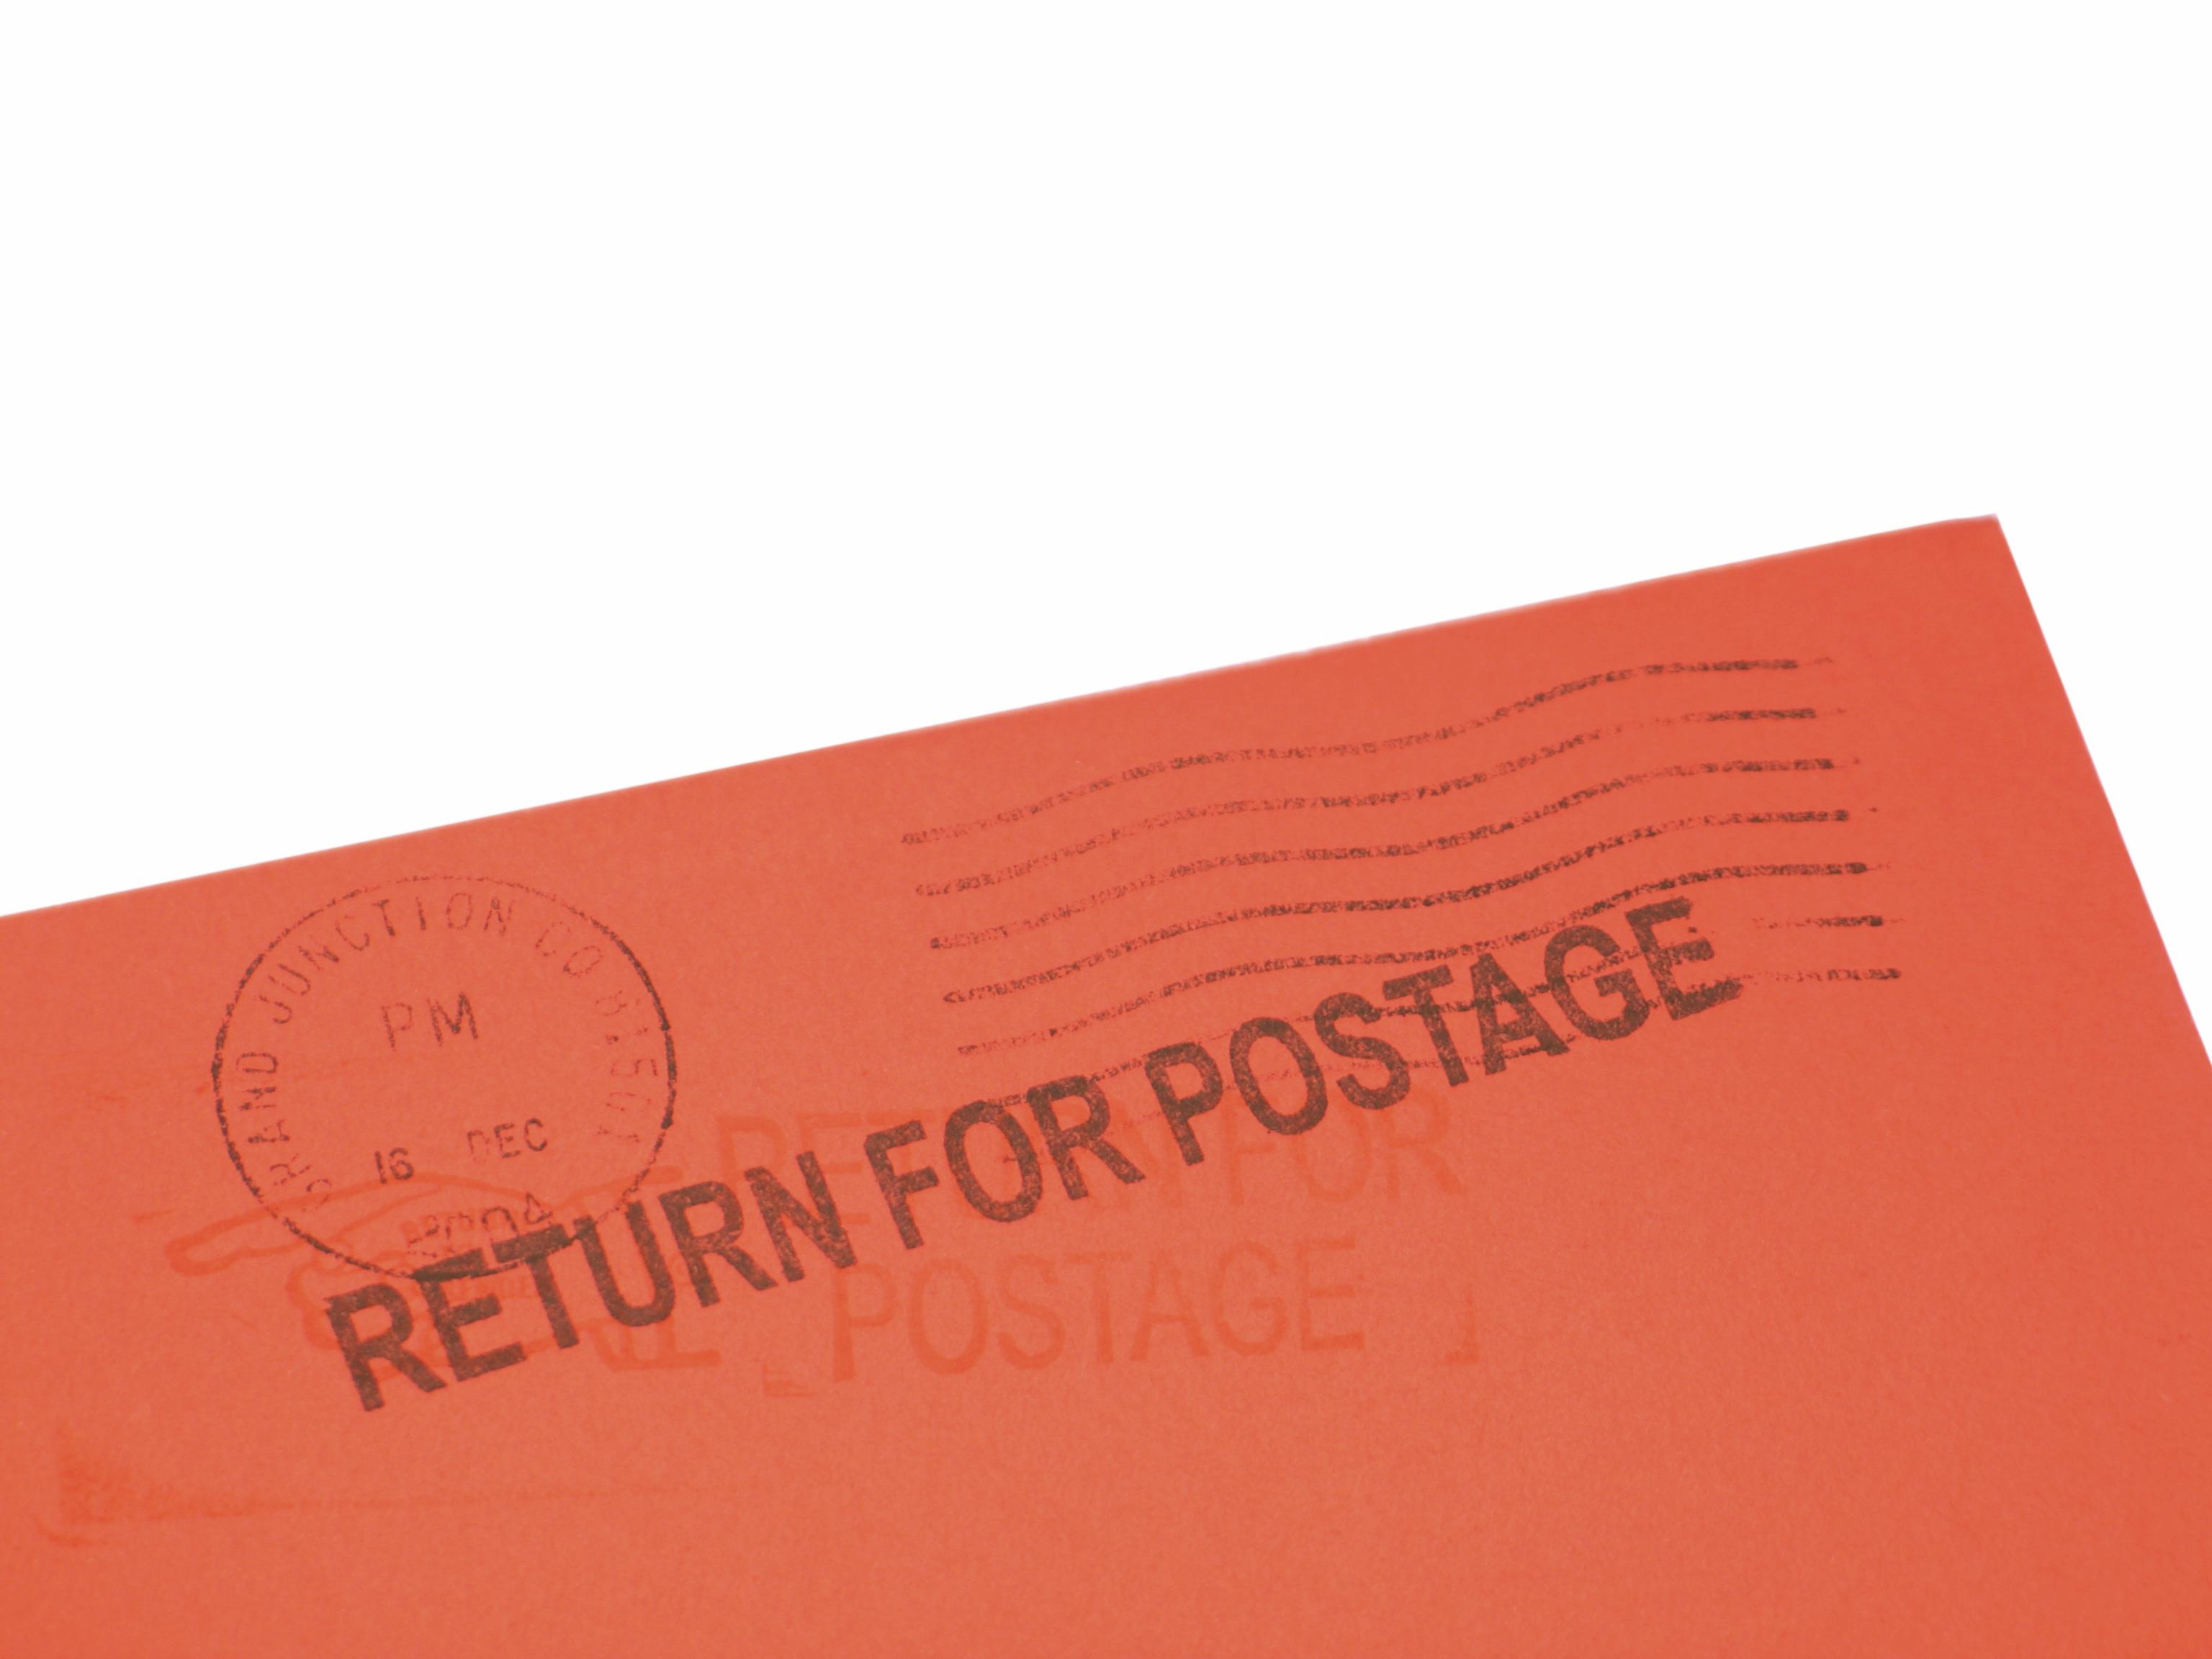 How Do I Pay Postage Due? | Bizfluent